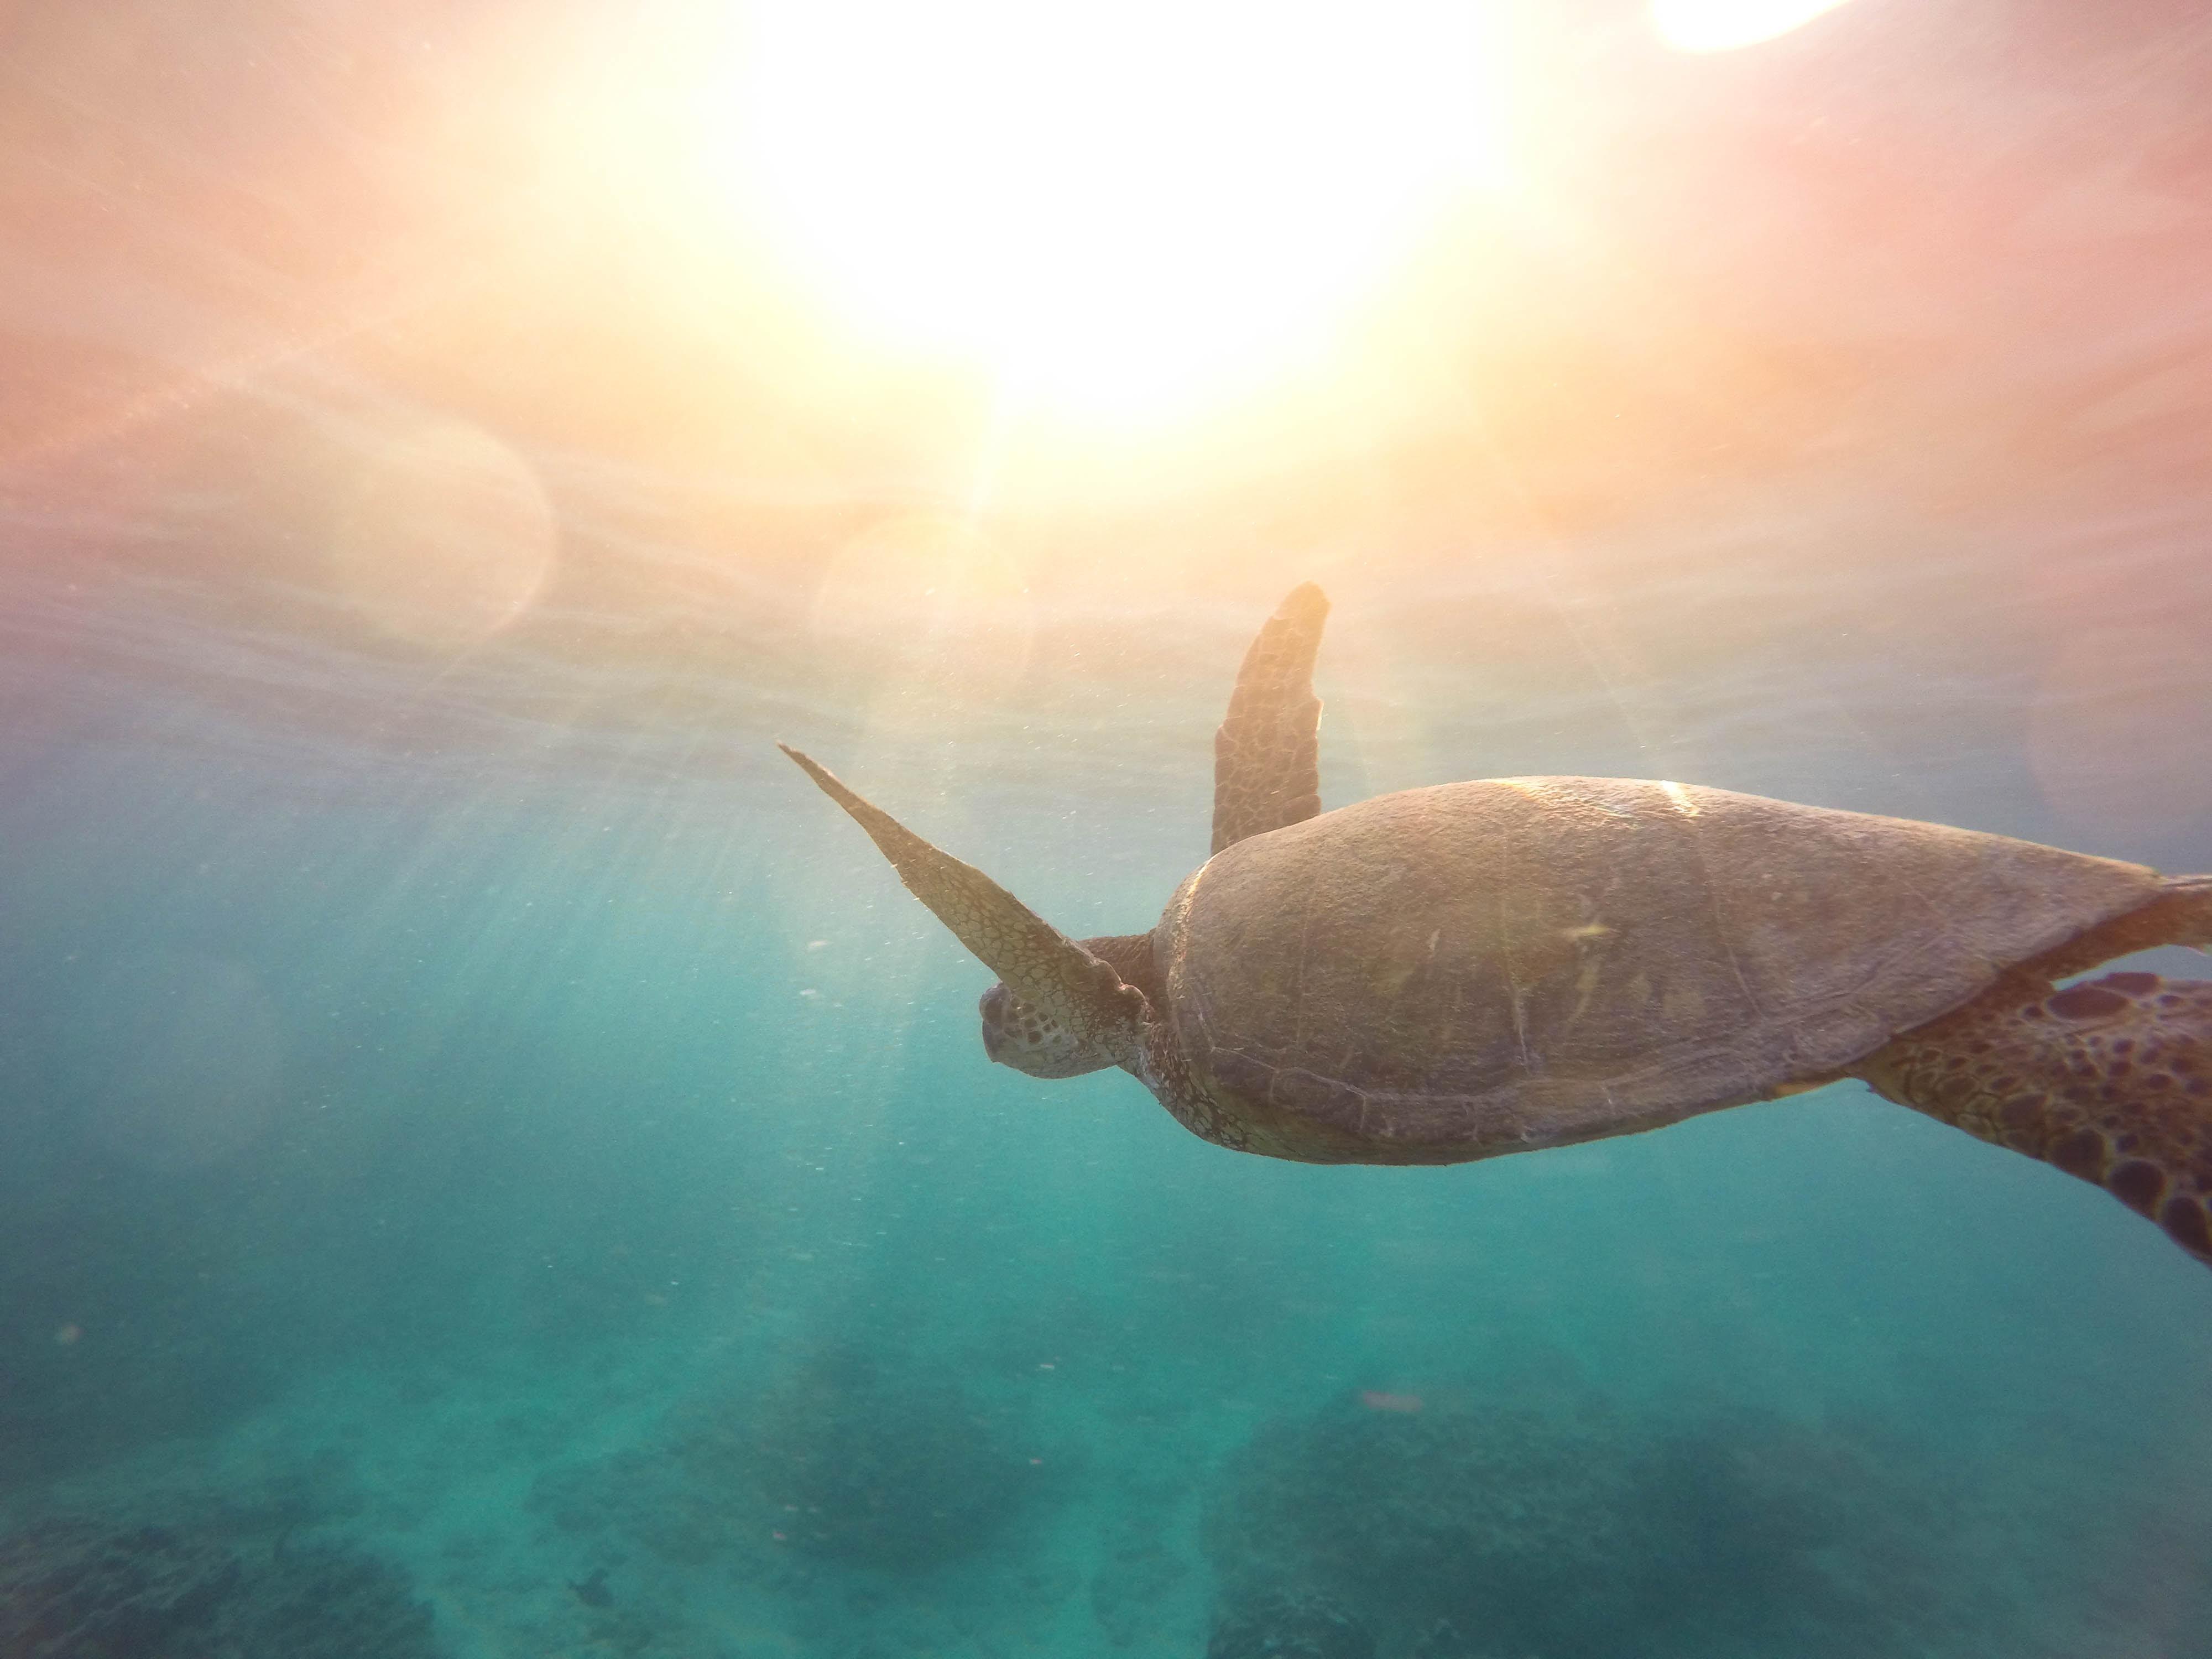 green turtle swimming on ocean